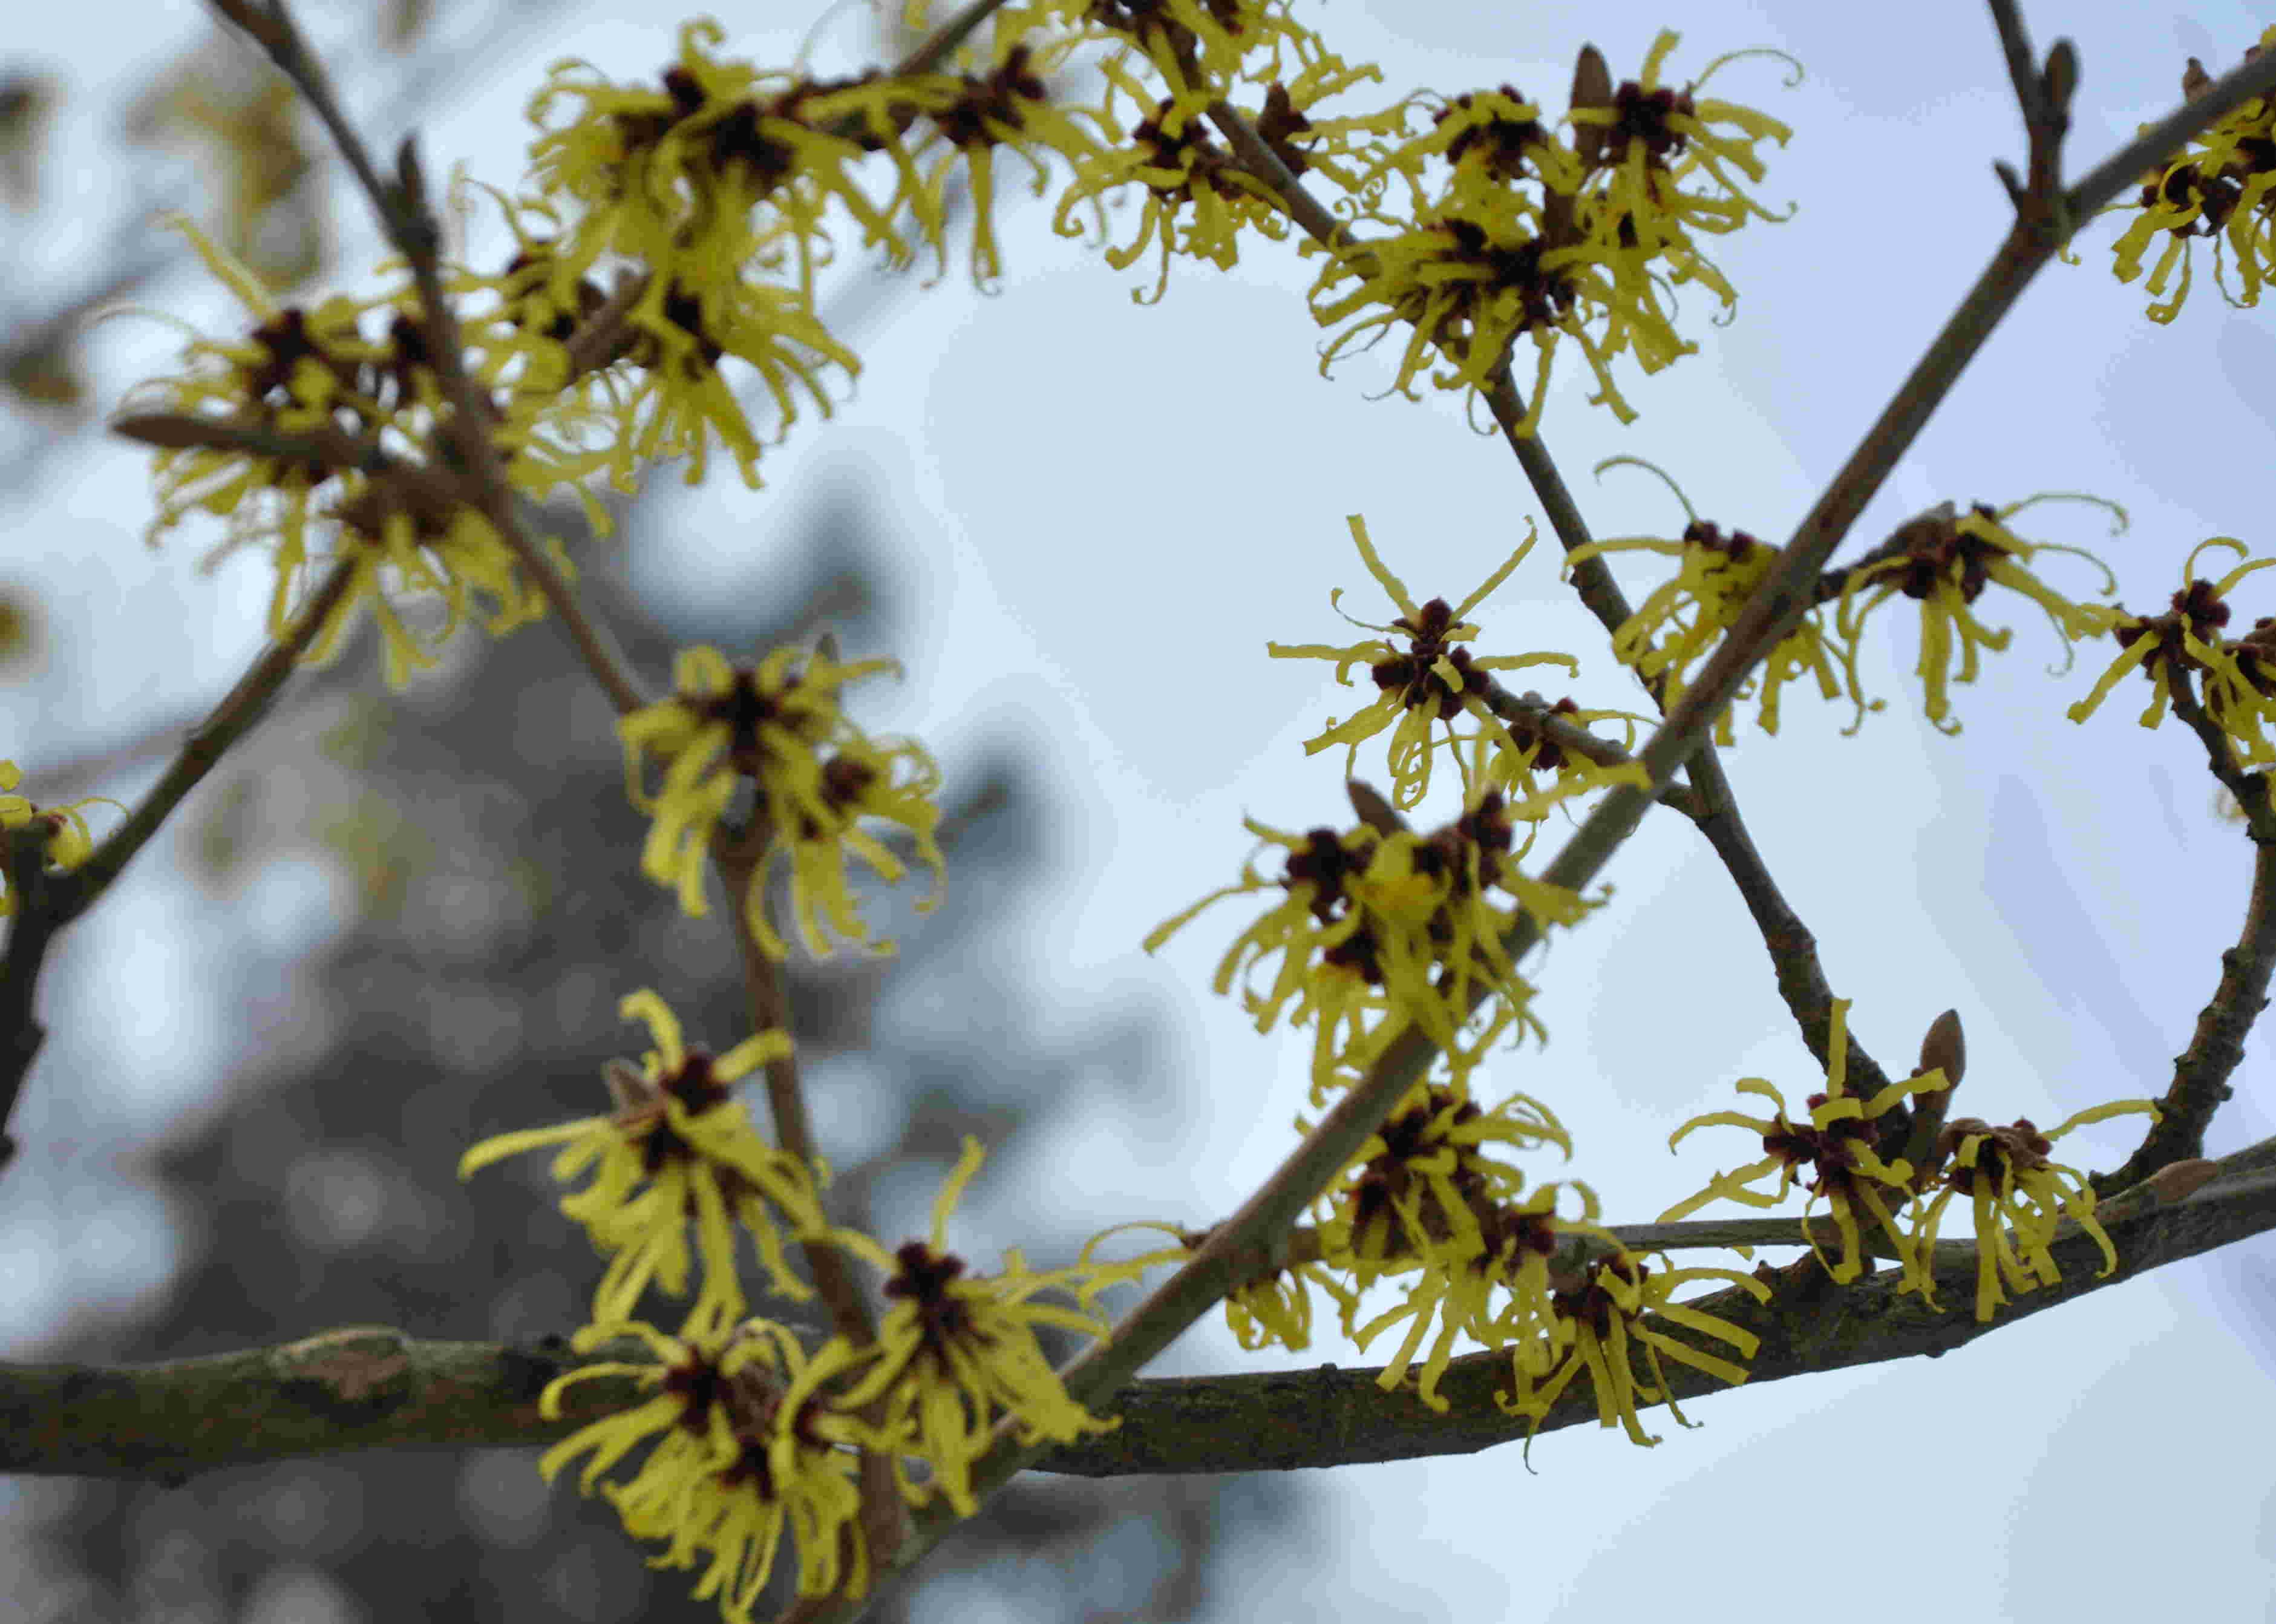 Hybridtrollhassel med stora blommor blommar tidigt.